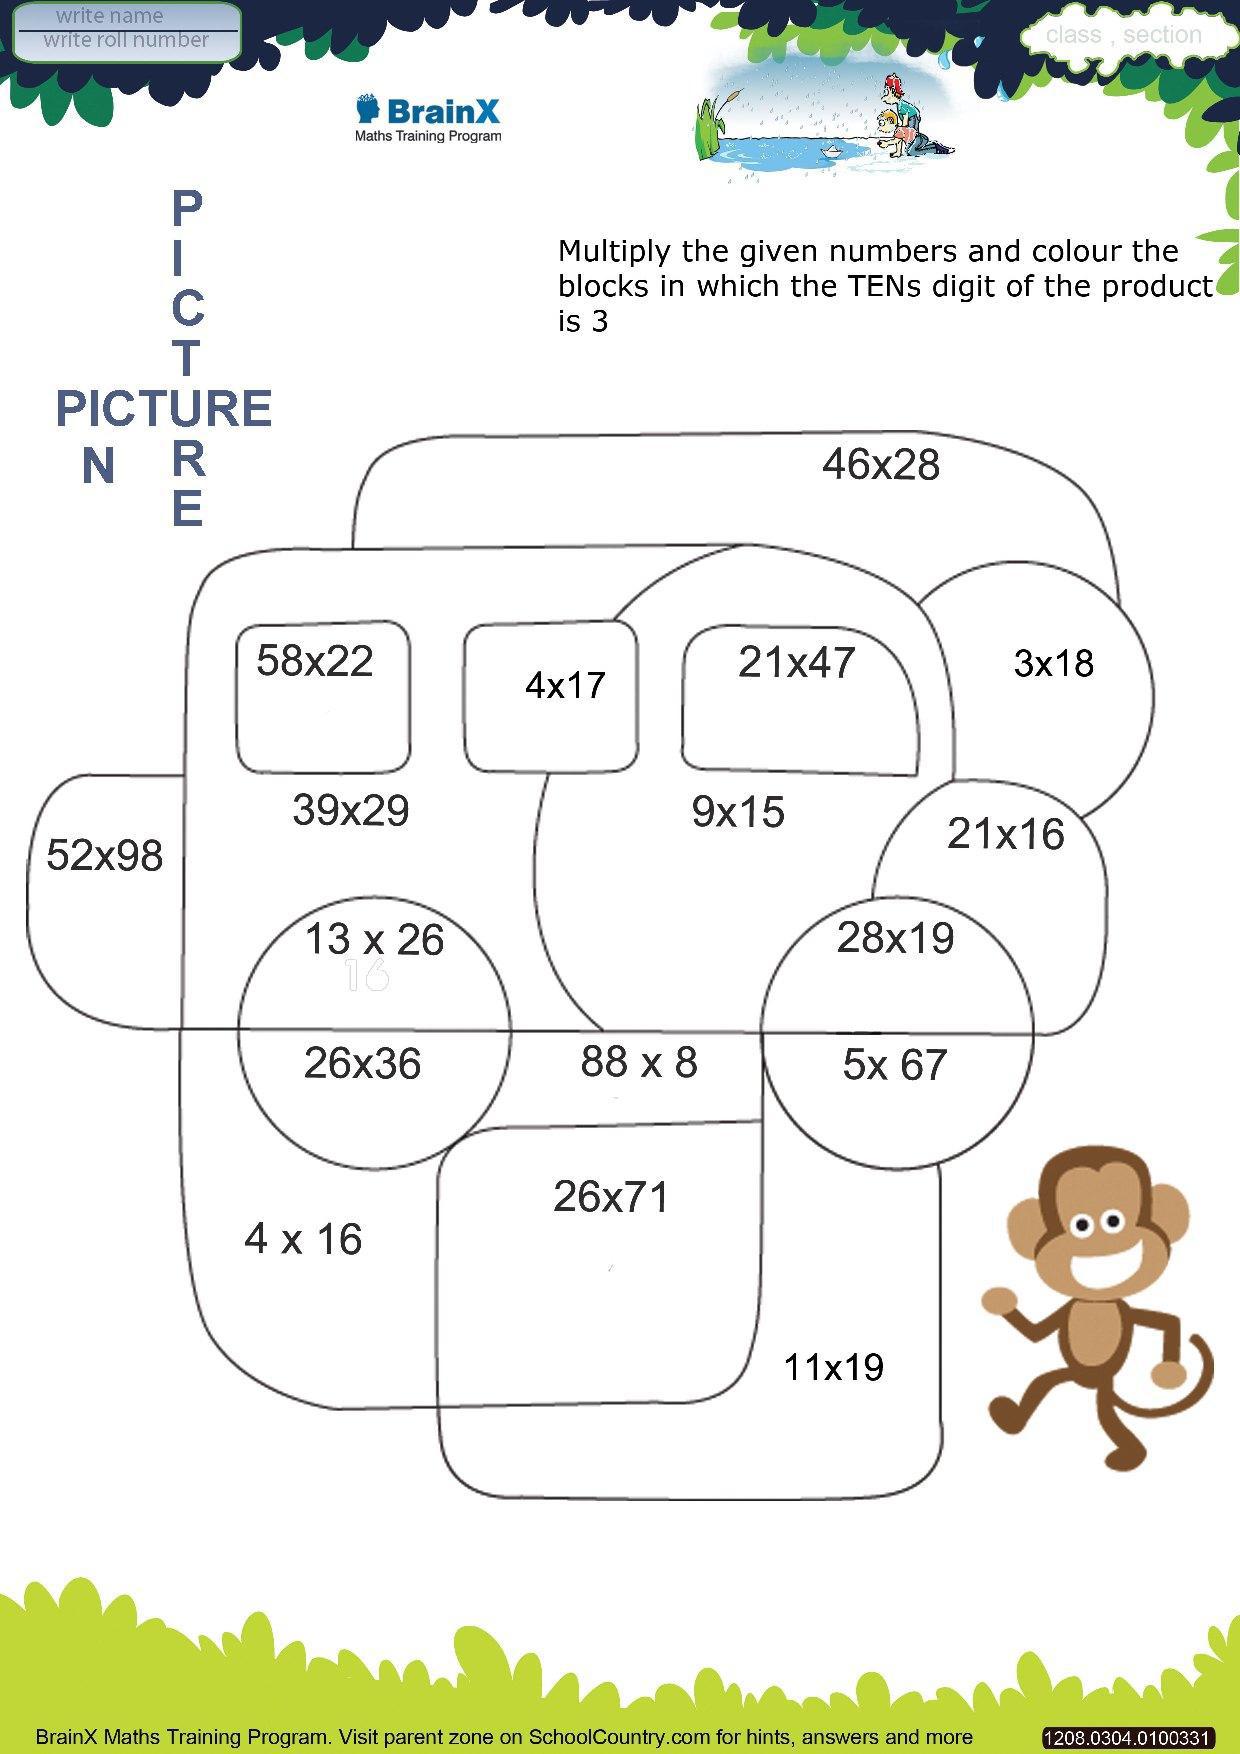 Worksheets For Grade 3 : Brainx grade mini math worksheets for